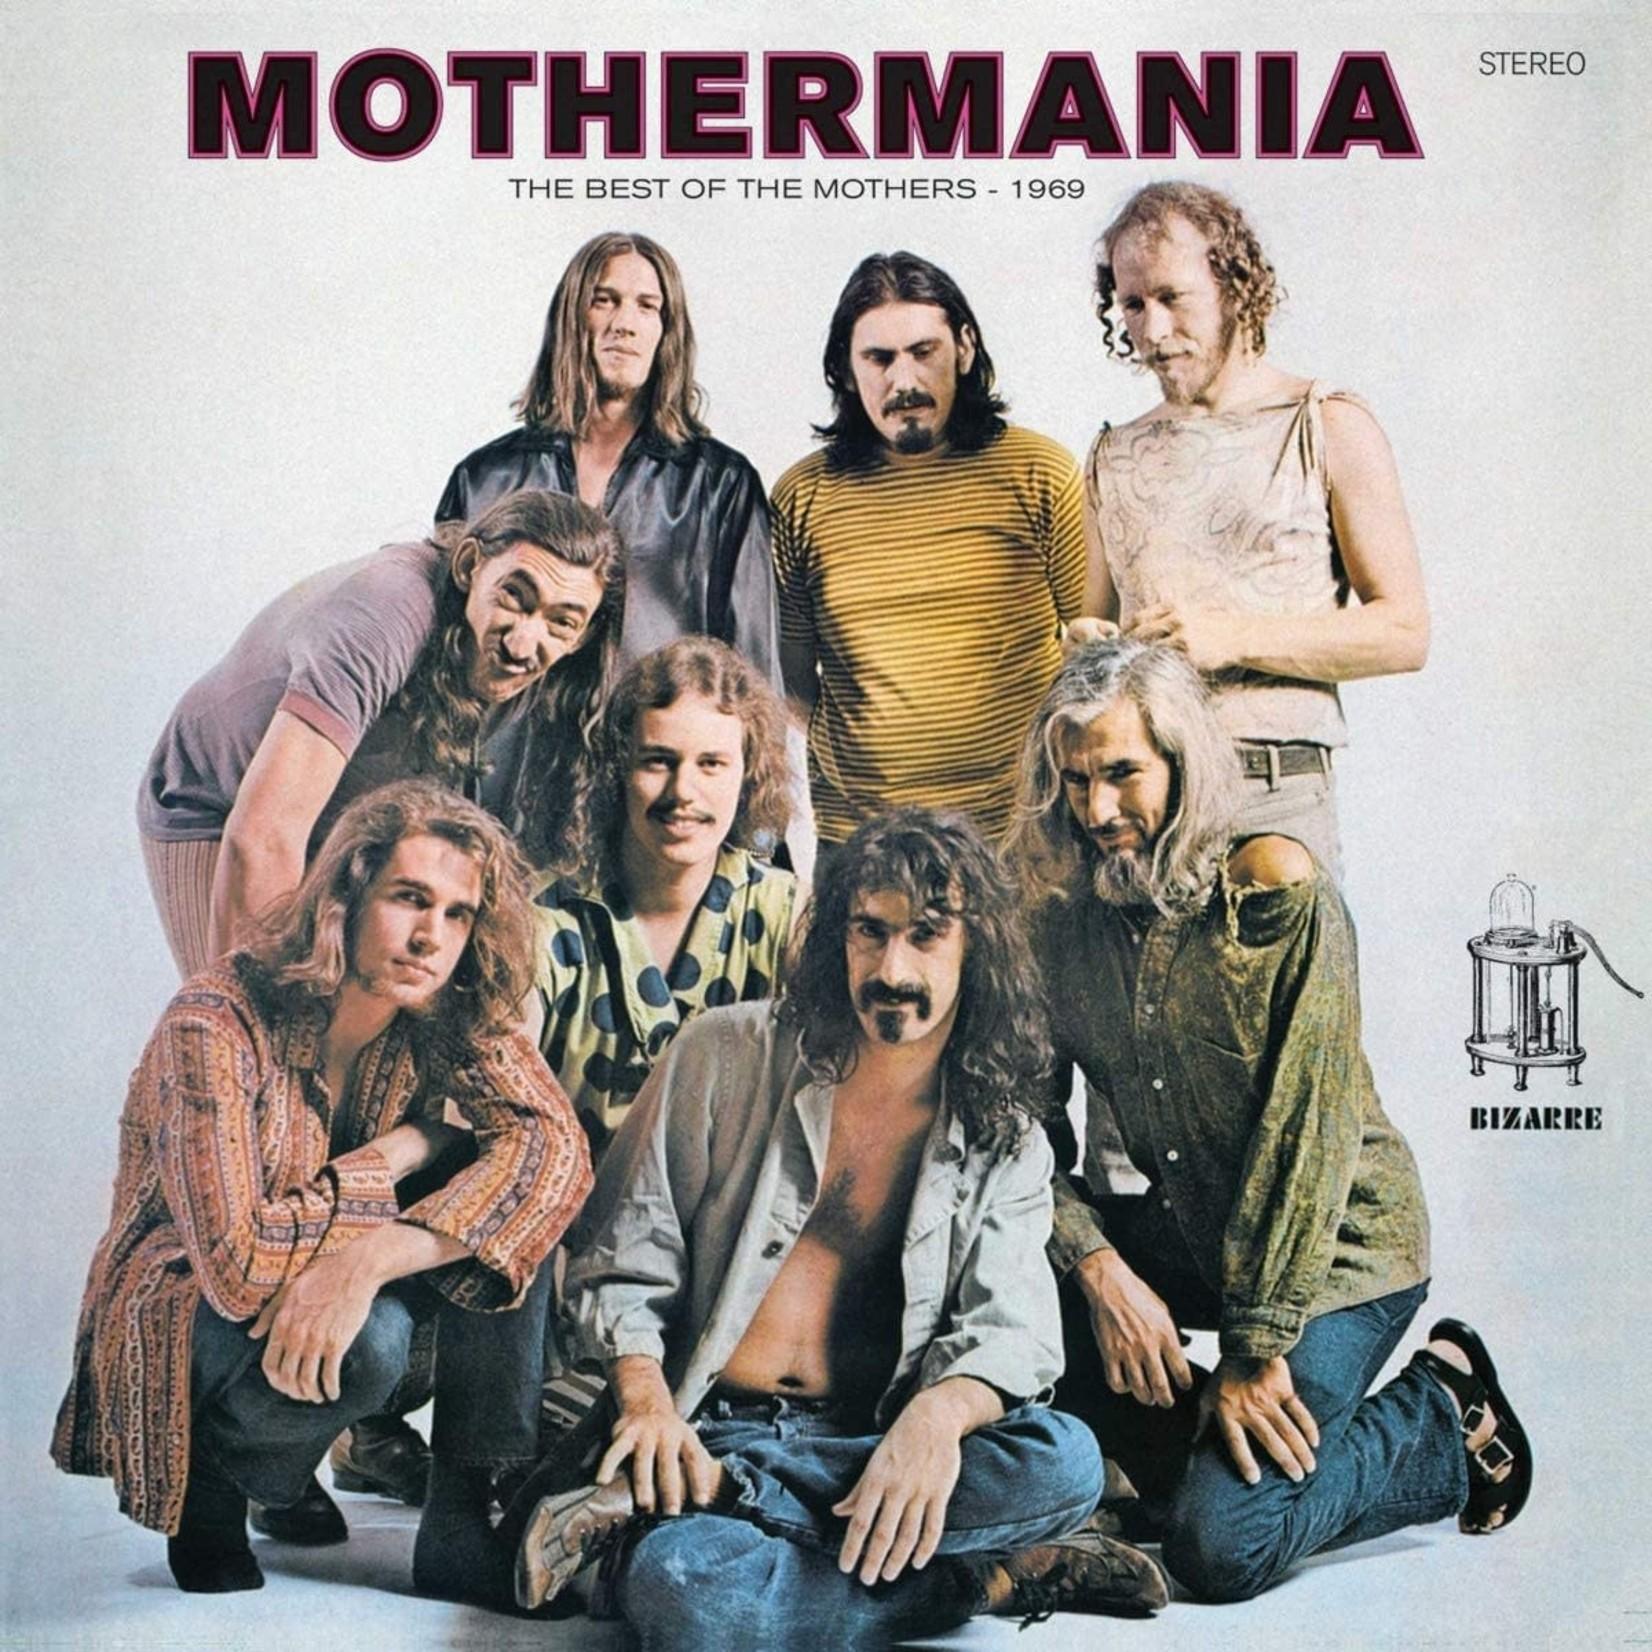 Frank Zappa Frank Zappa - Mothermania